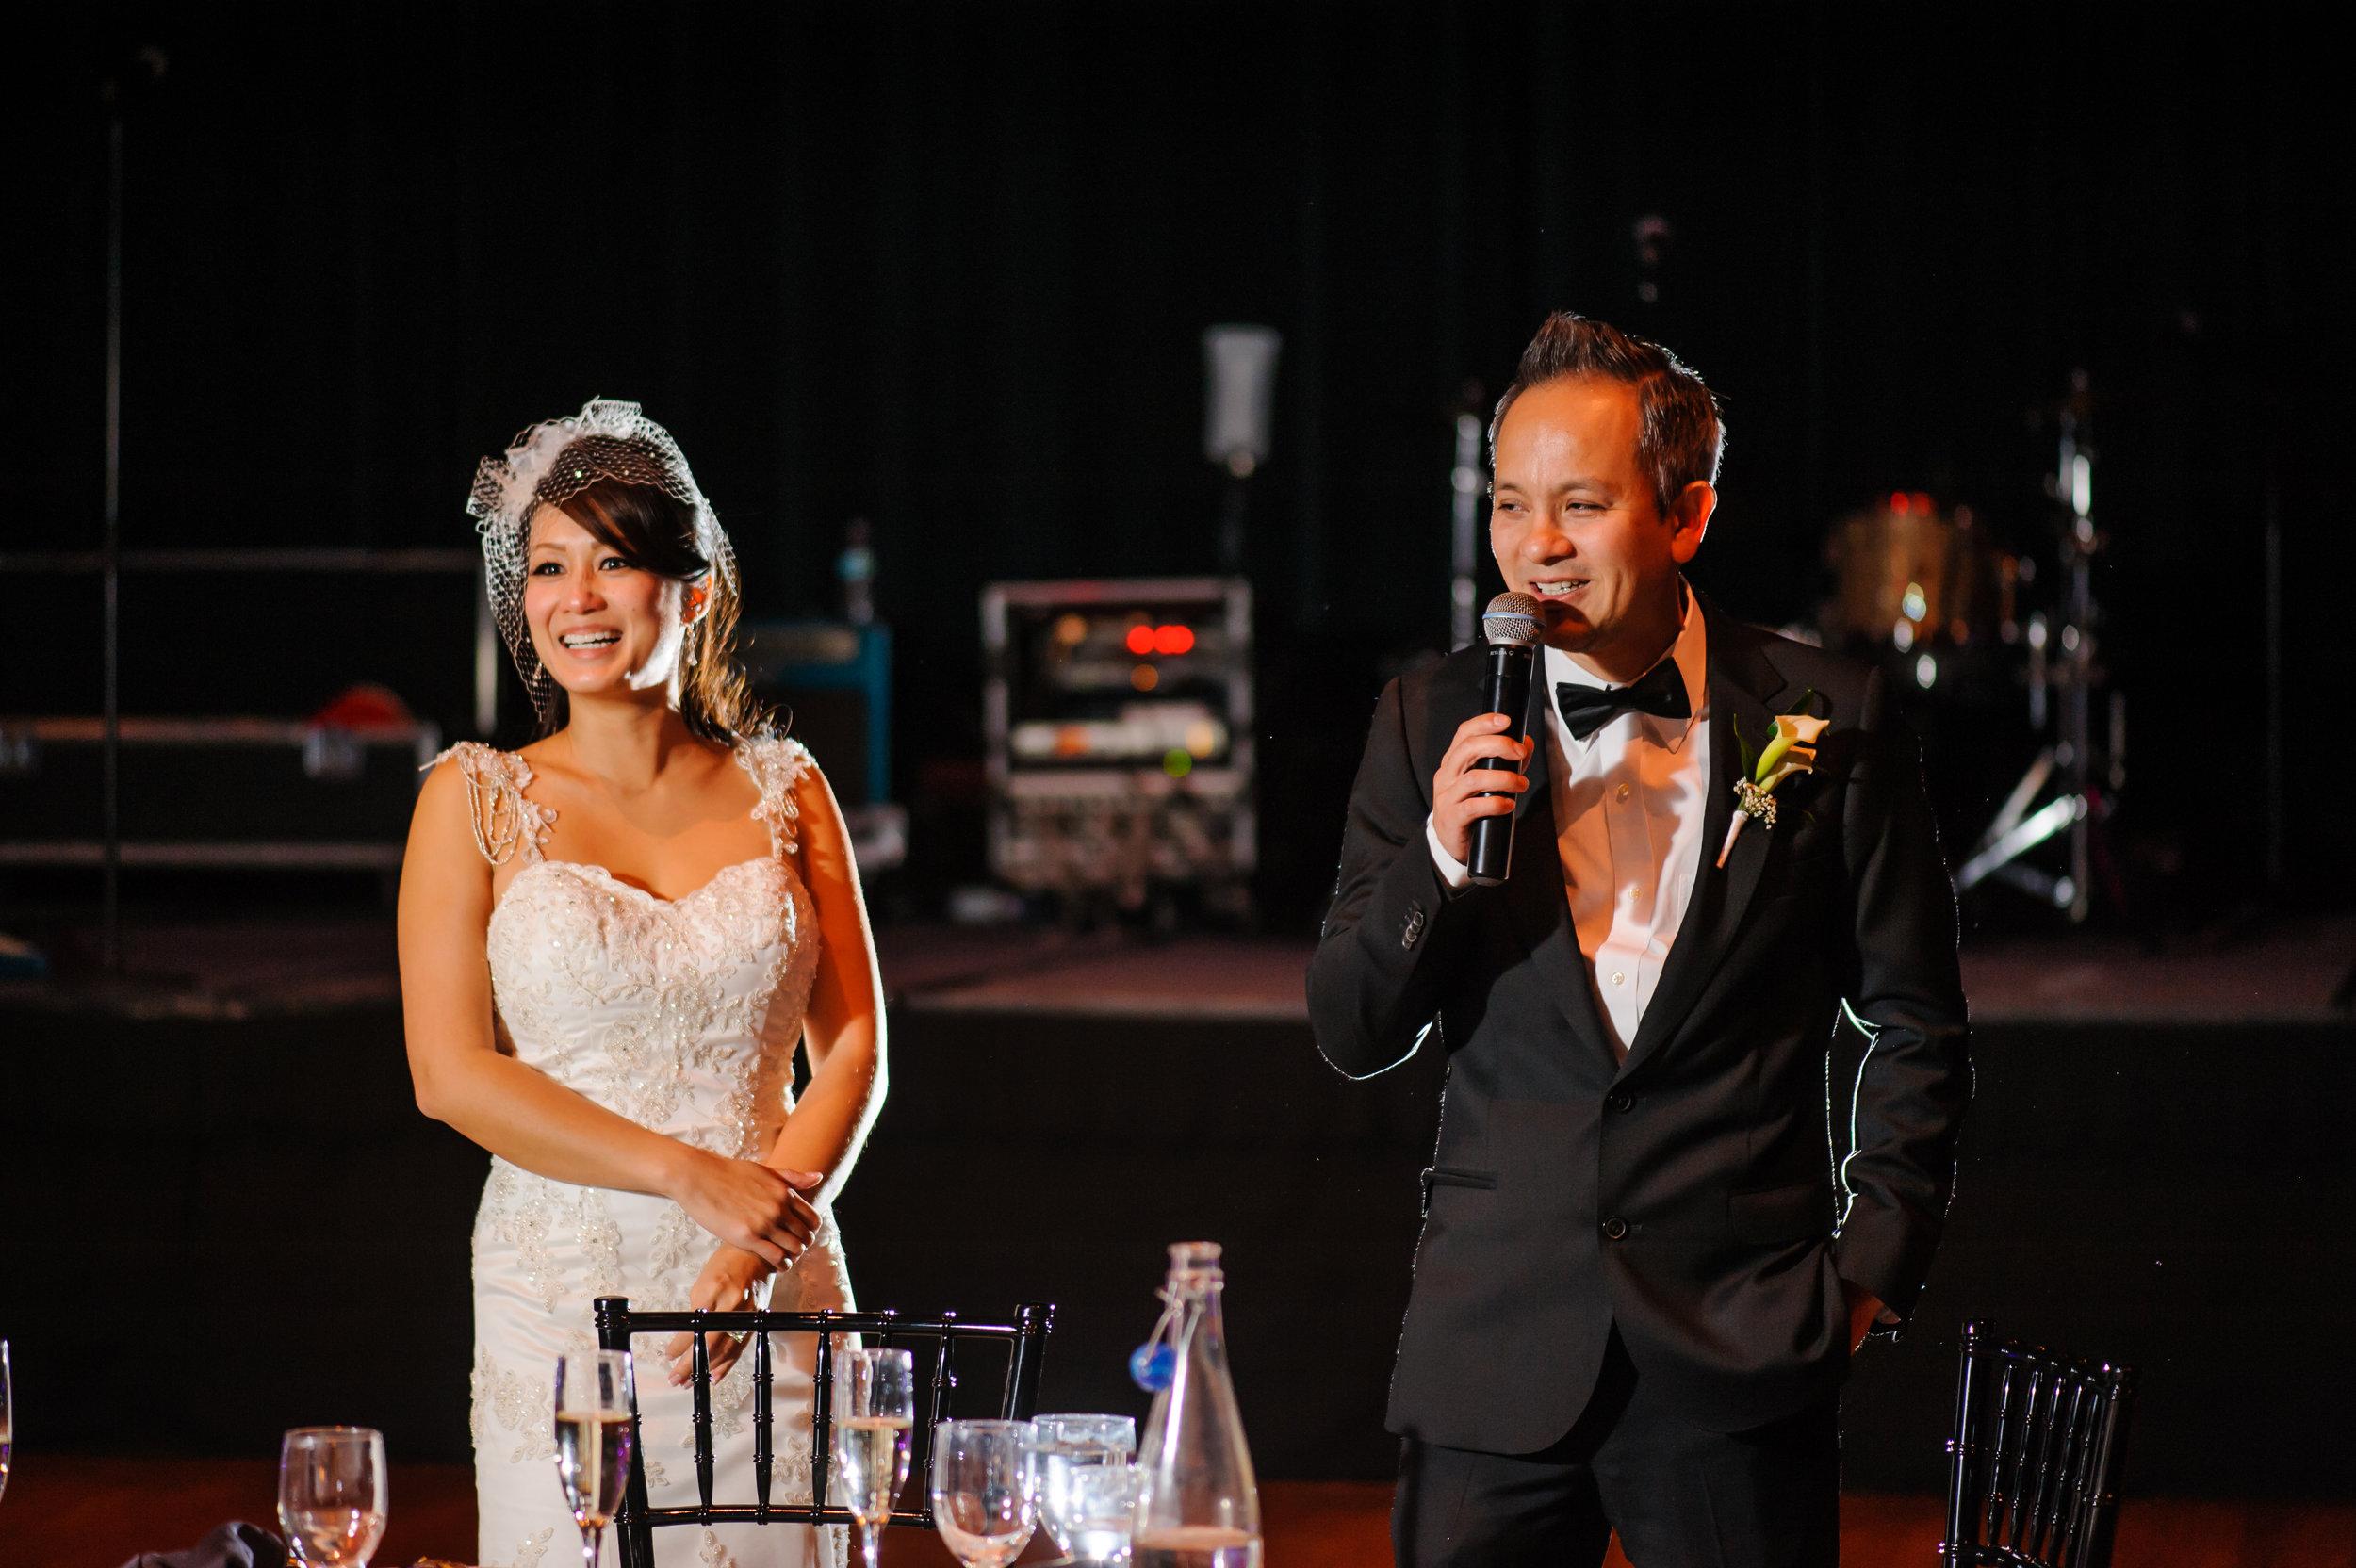 camilla-thuy-061-memorial-auditorium-sacramento-wedding-photographer-katherine-nicole-photography.JPG